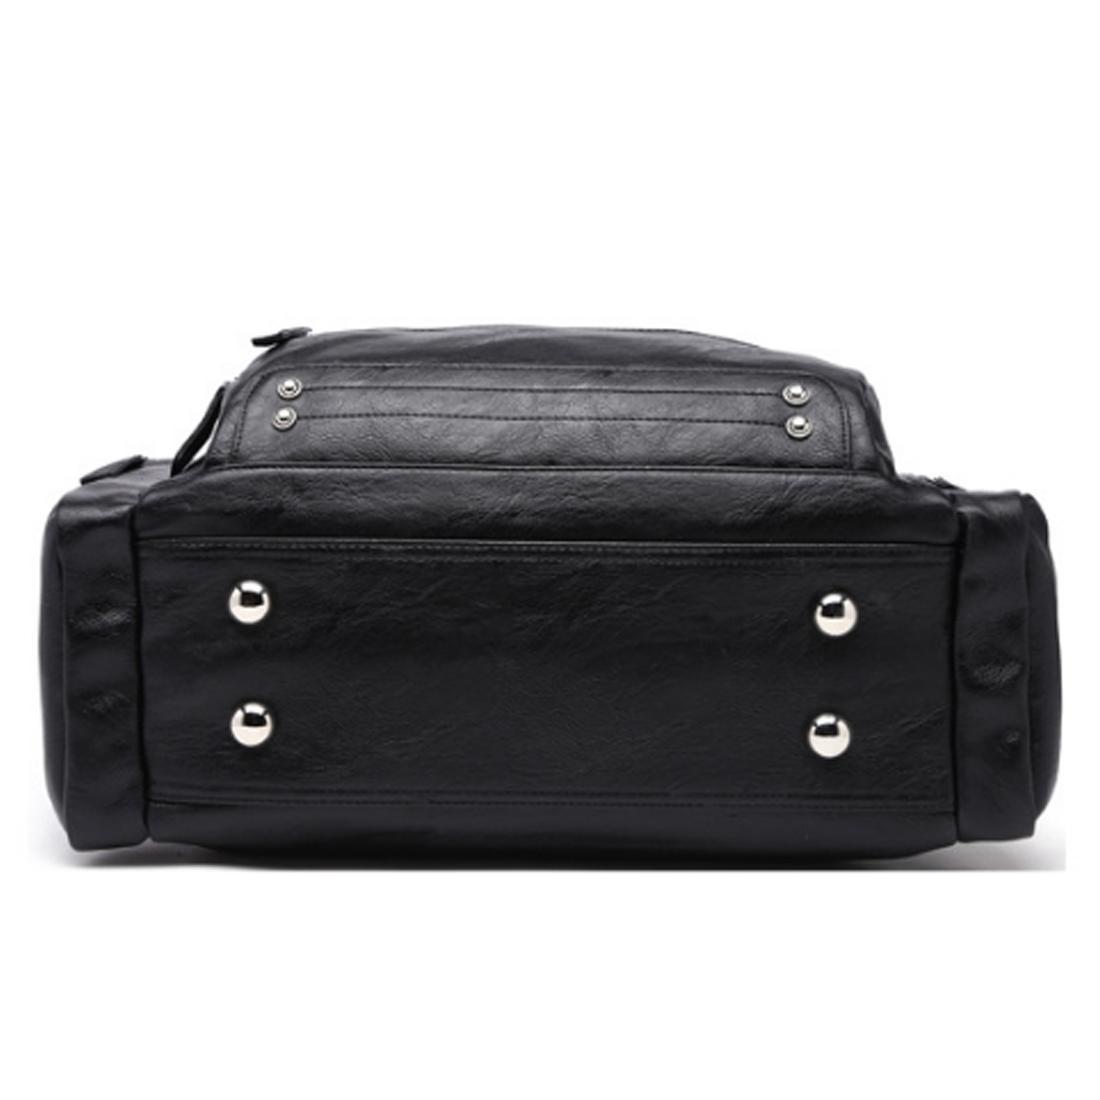 Fitness Single-shoulder Bag PU Travel Handbag Portable Cross Body Bag for  Man Luggage Bag - Black  Buy Sell Online   Best Prices in Pakistan  db35671fec613